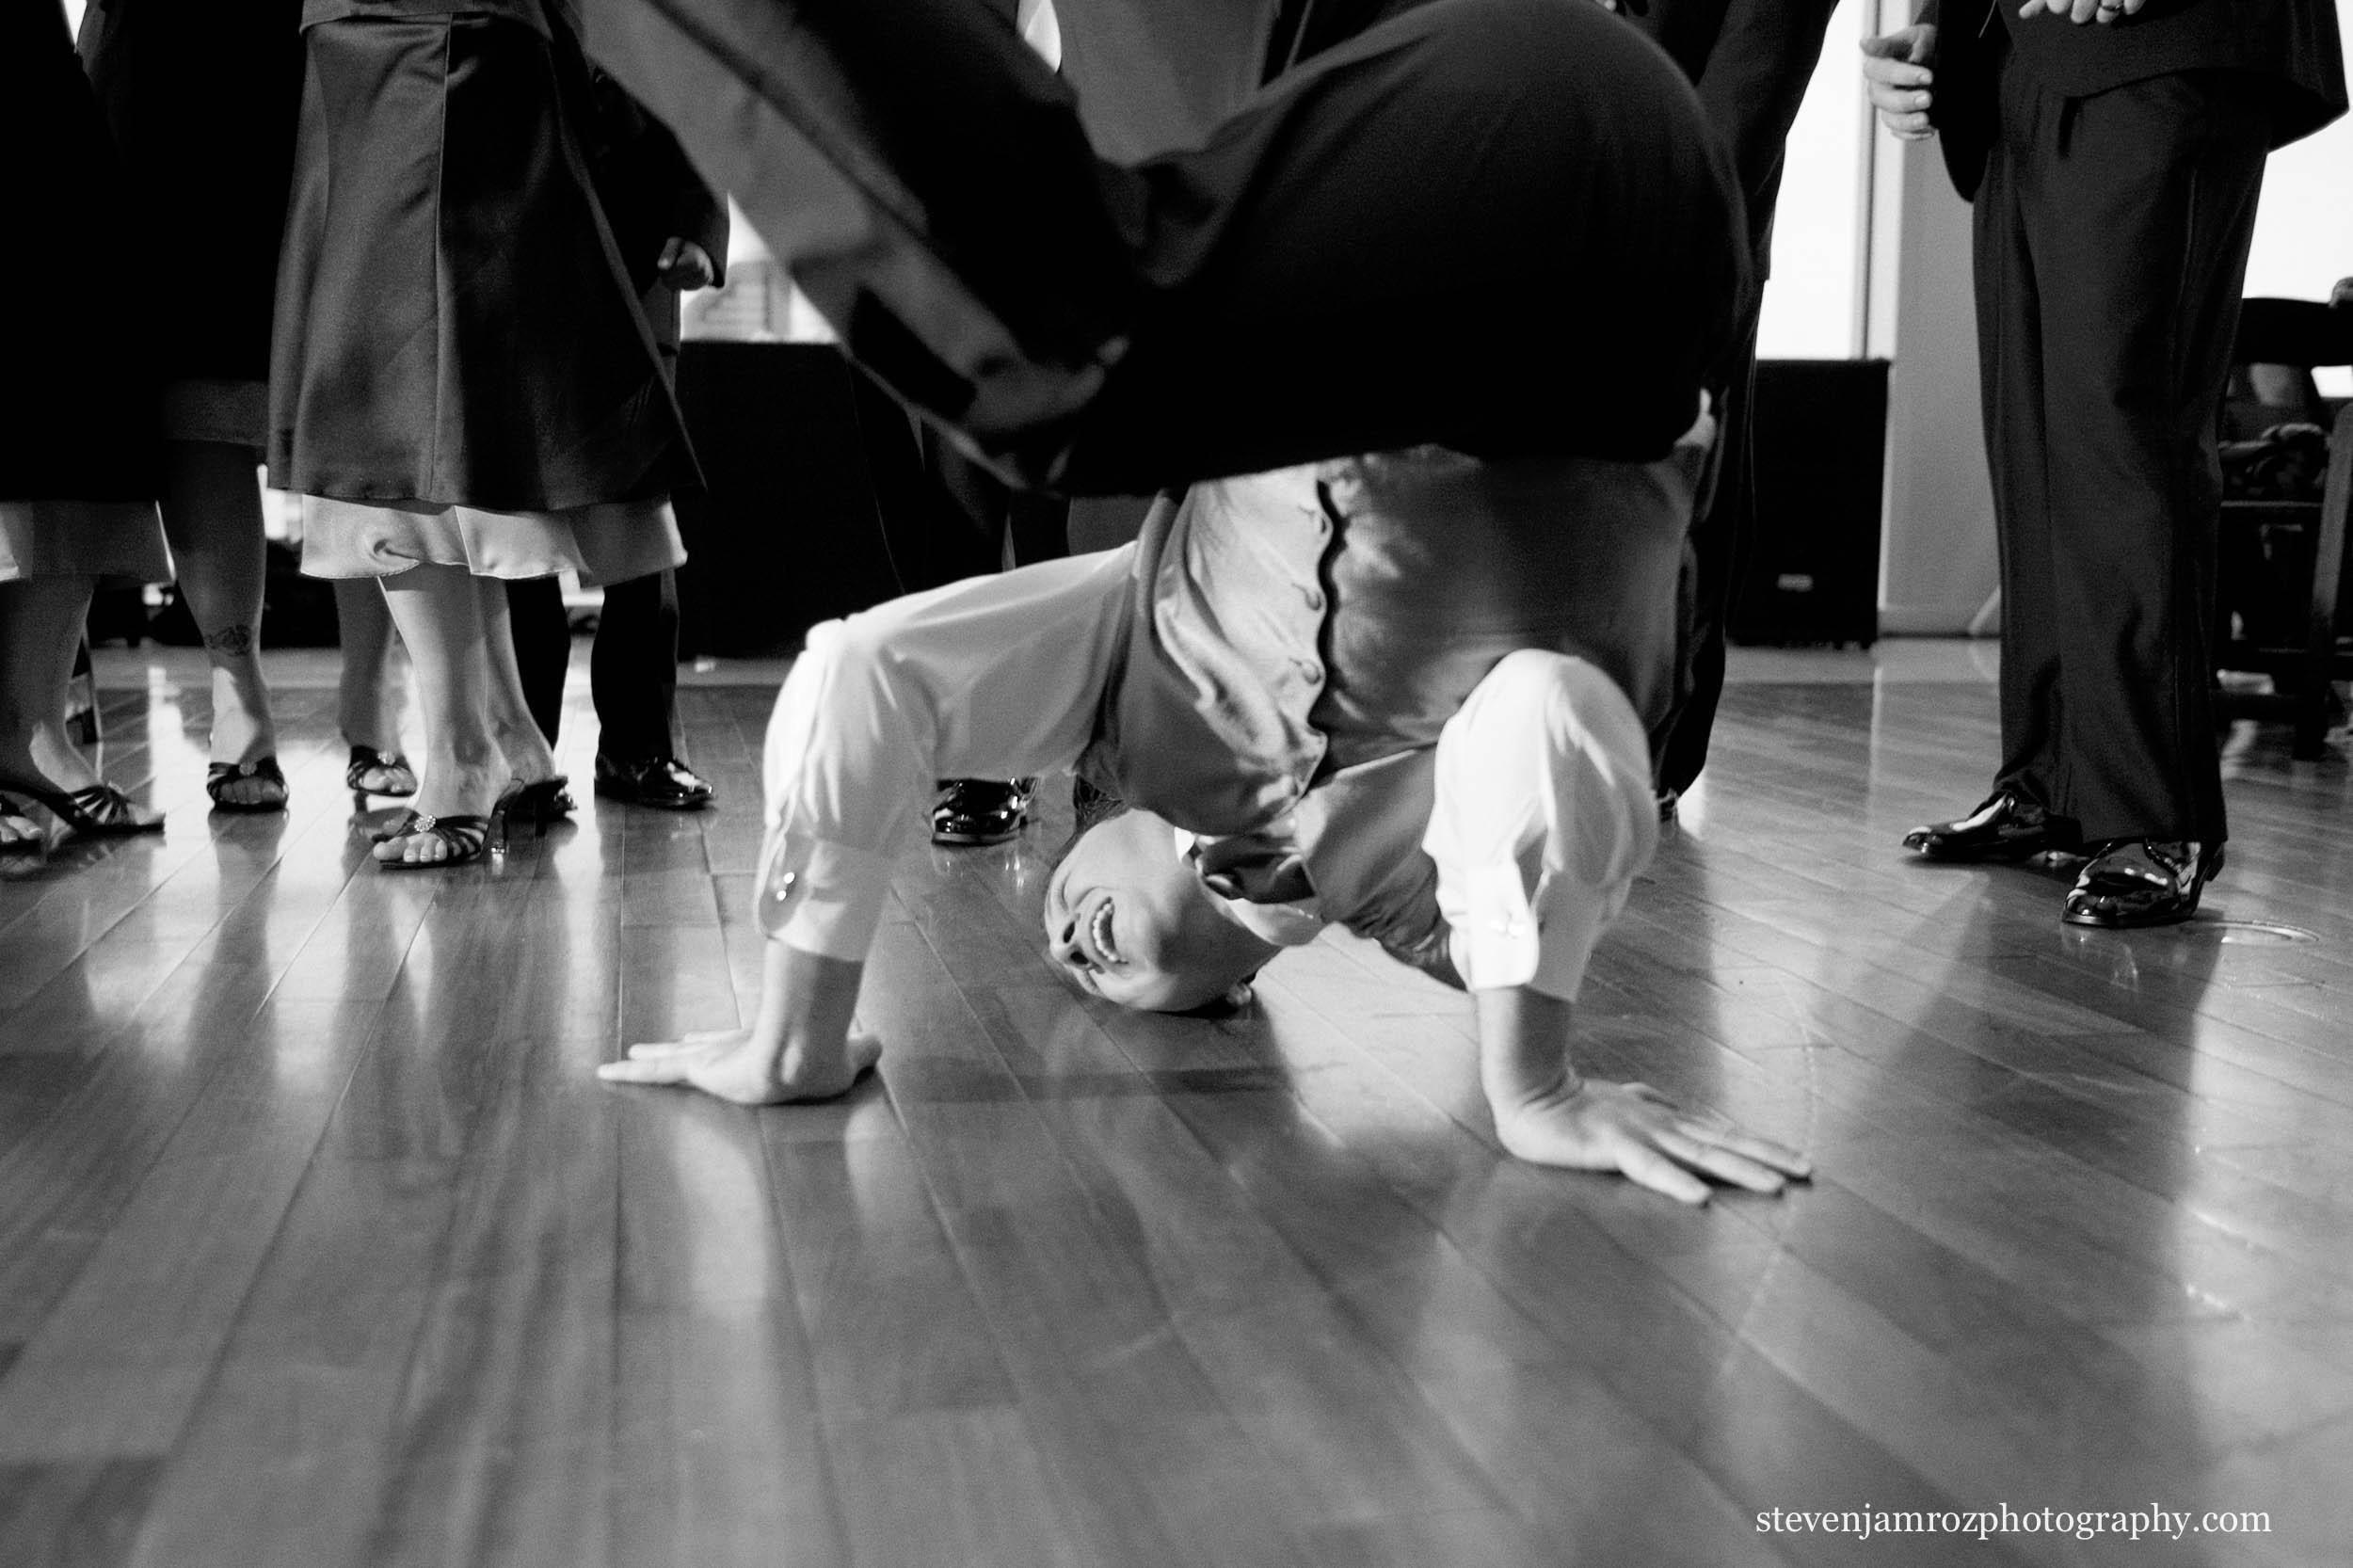 dancing and partying-durham-nc-wedding-steven-jamroz-photography-0445.jpg